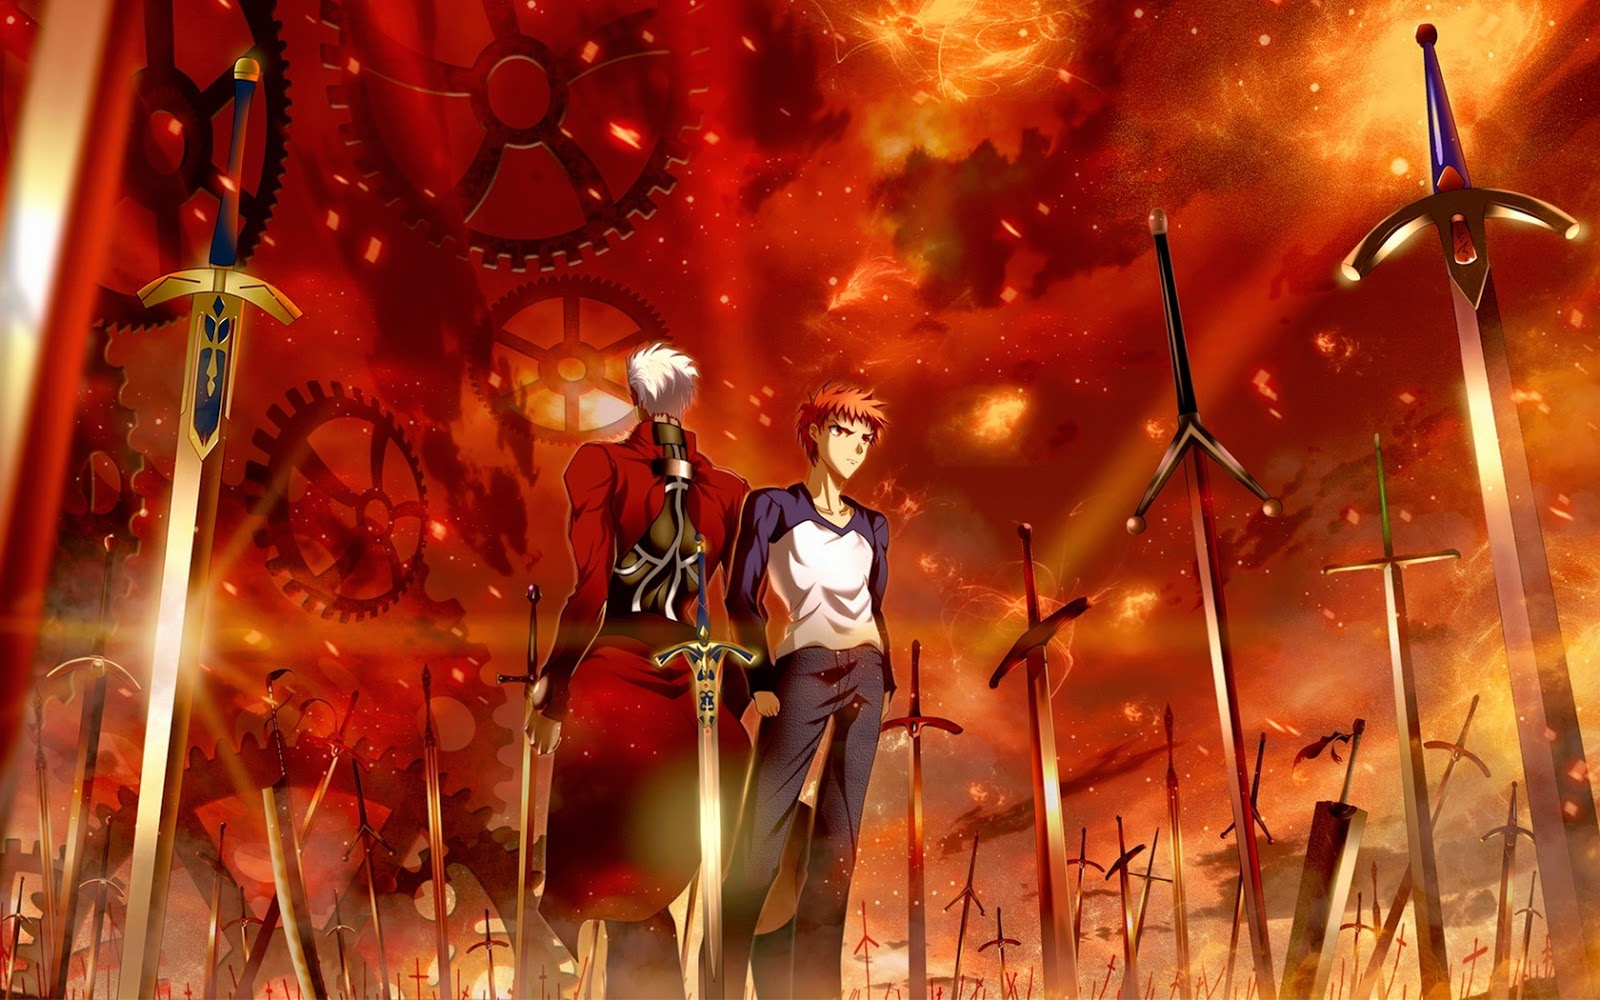 Mashiro Ayano - Ideal White (Fate/stay night : Unlimited Blade Works OP) Lyrics + Music